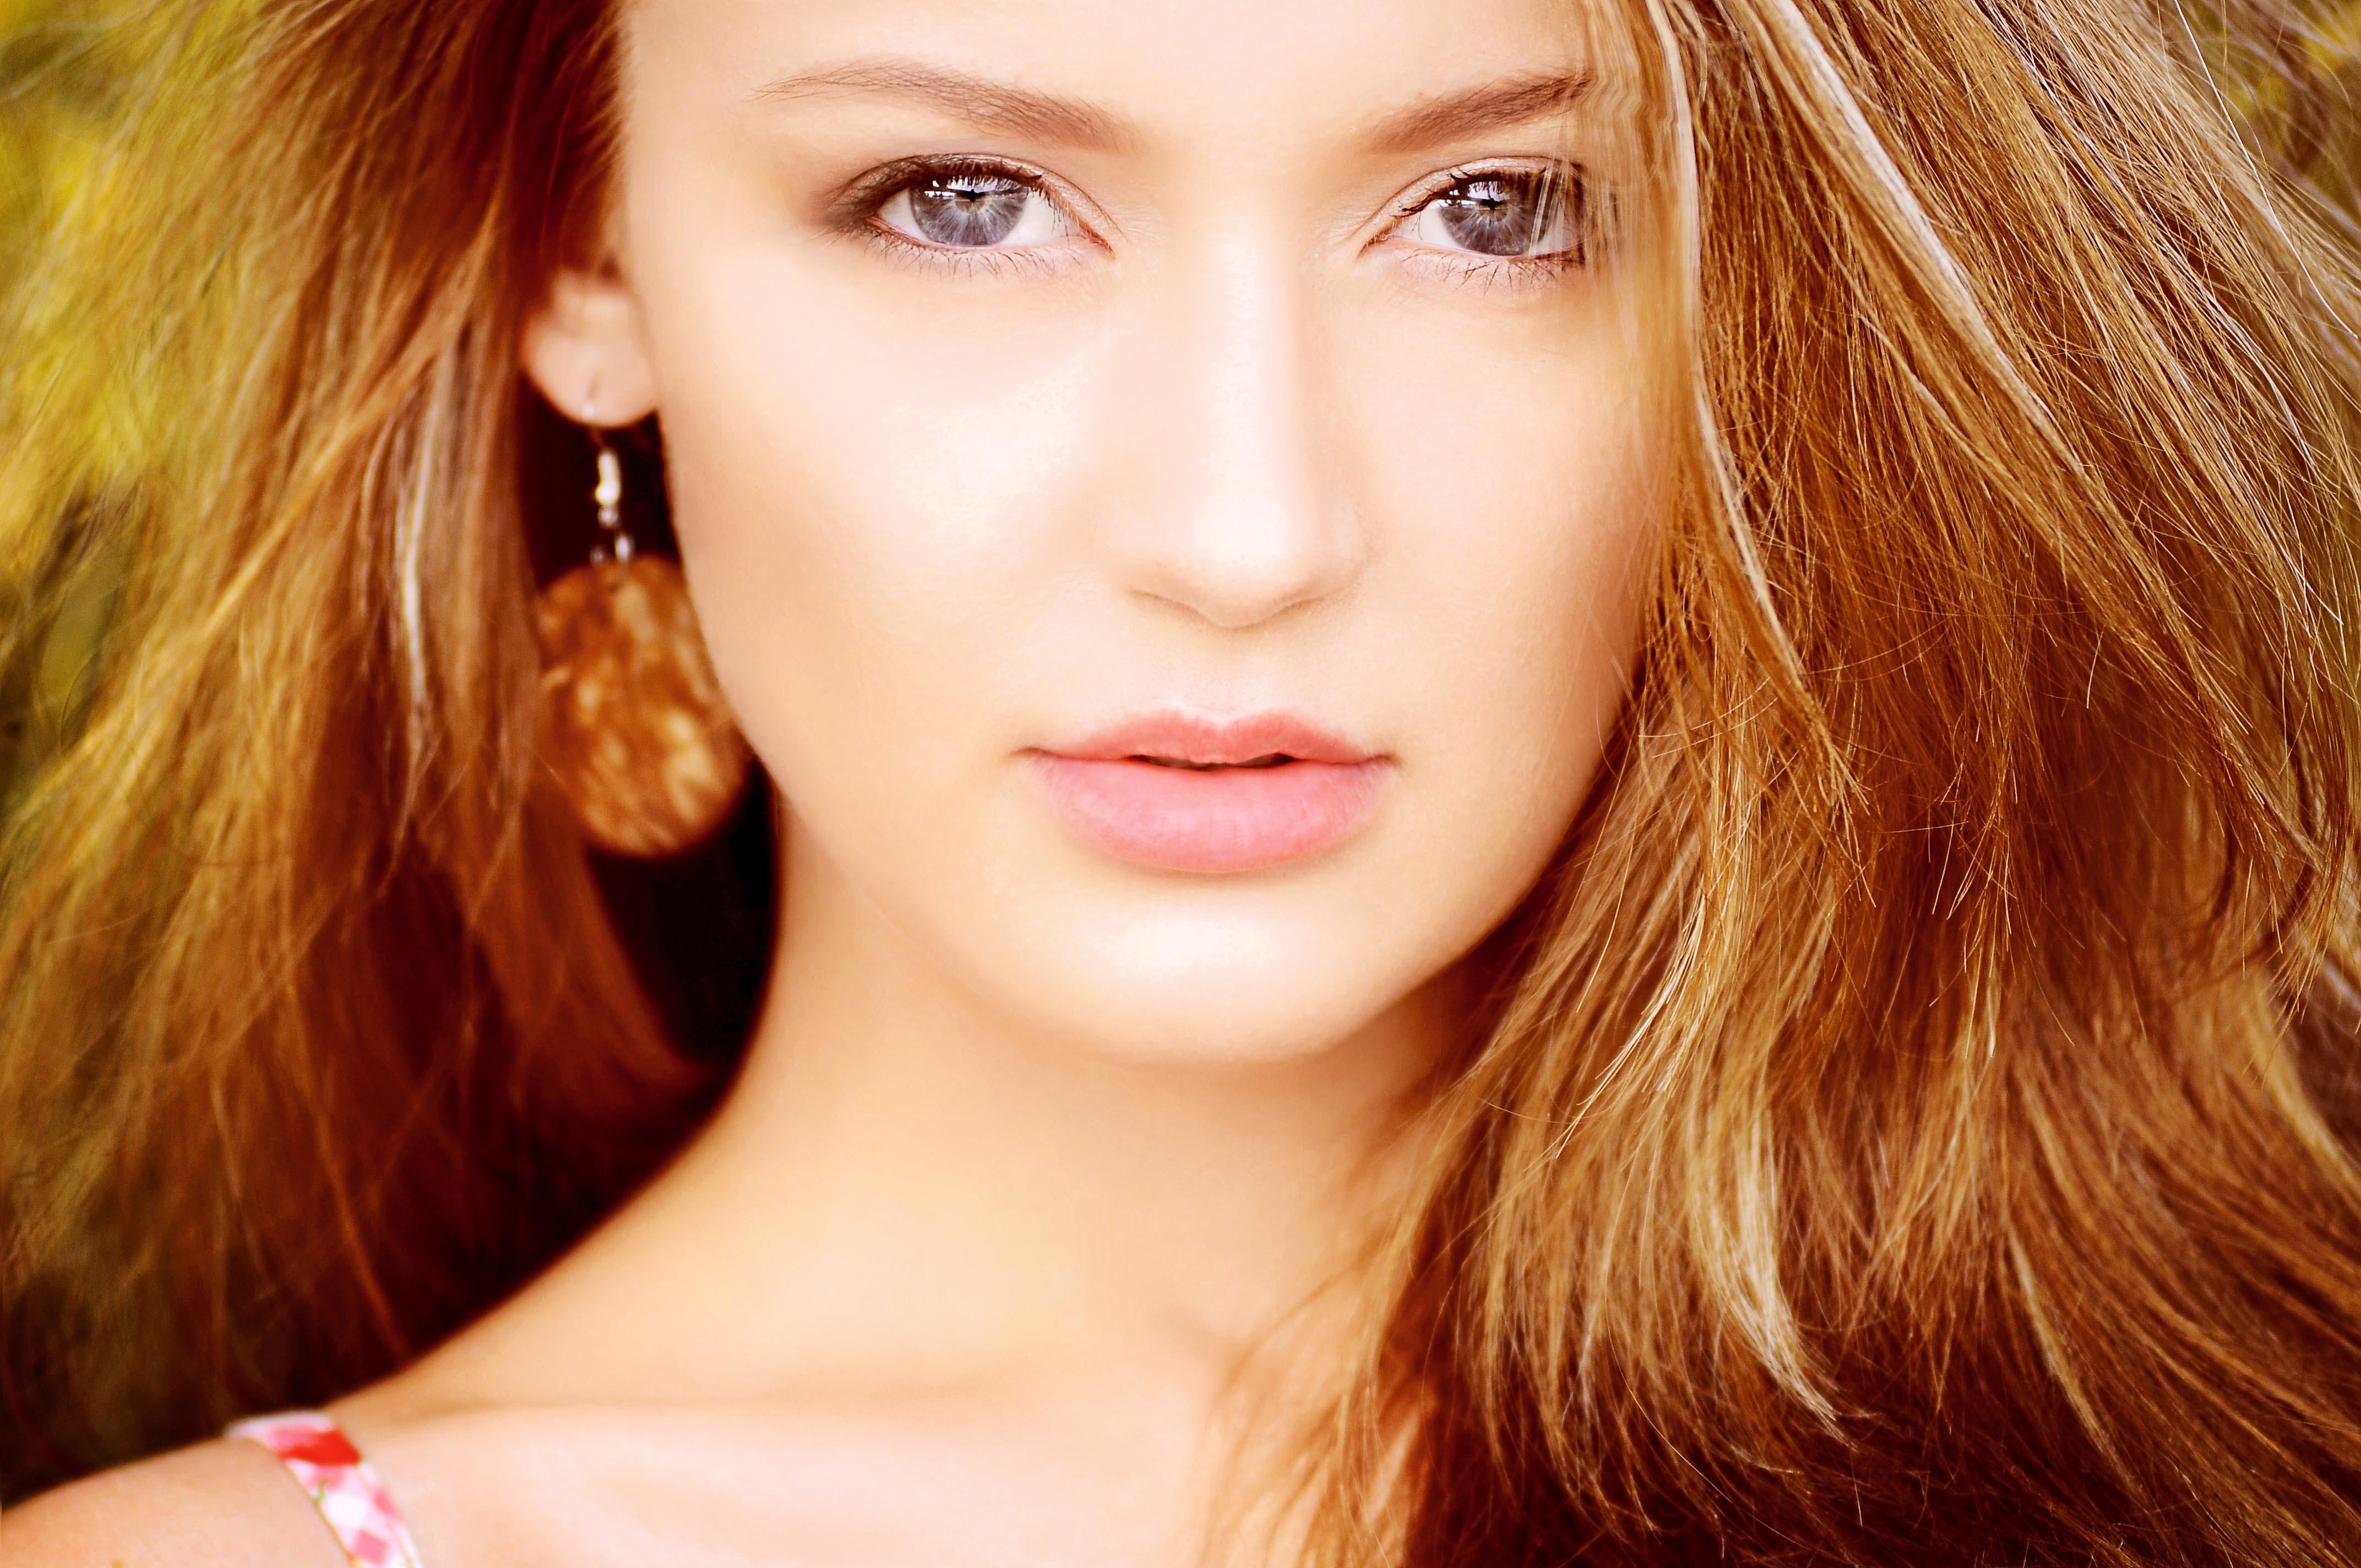 BEAUTIFUL BLONDE HAIR girl for web